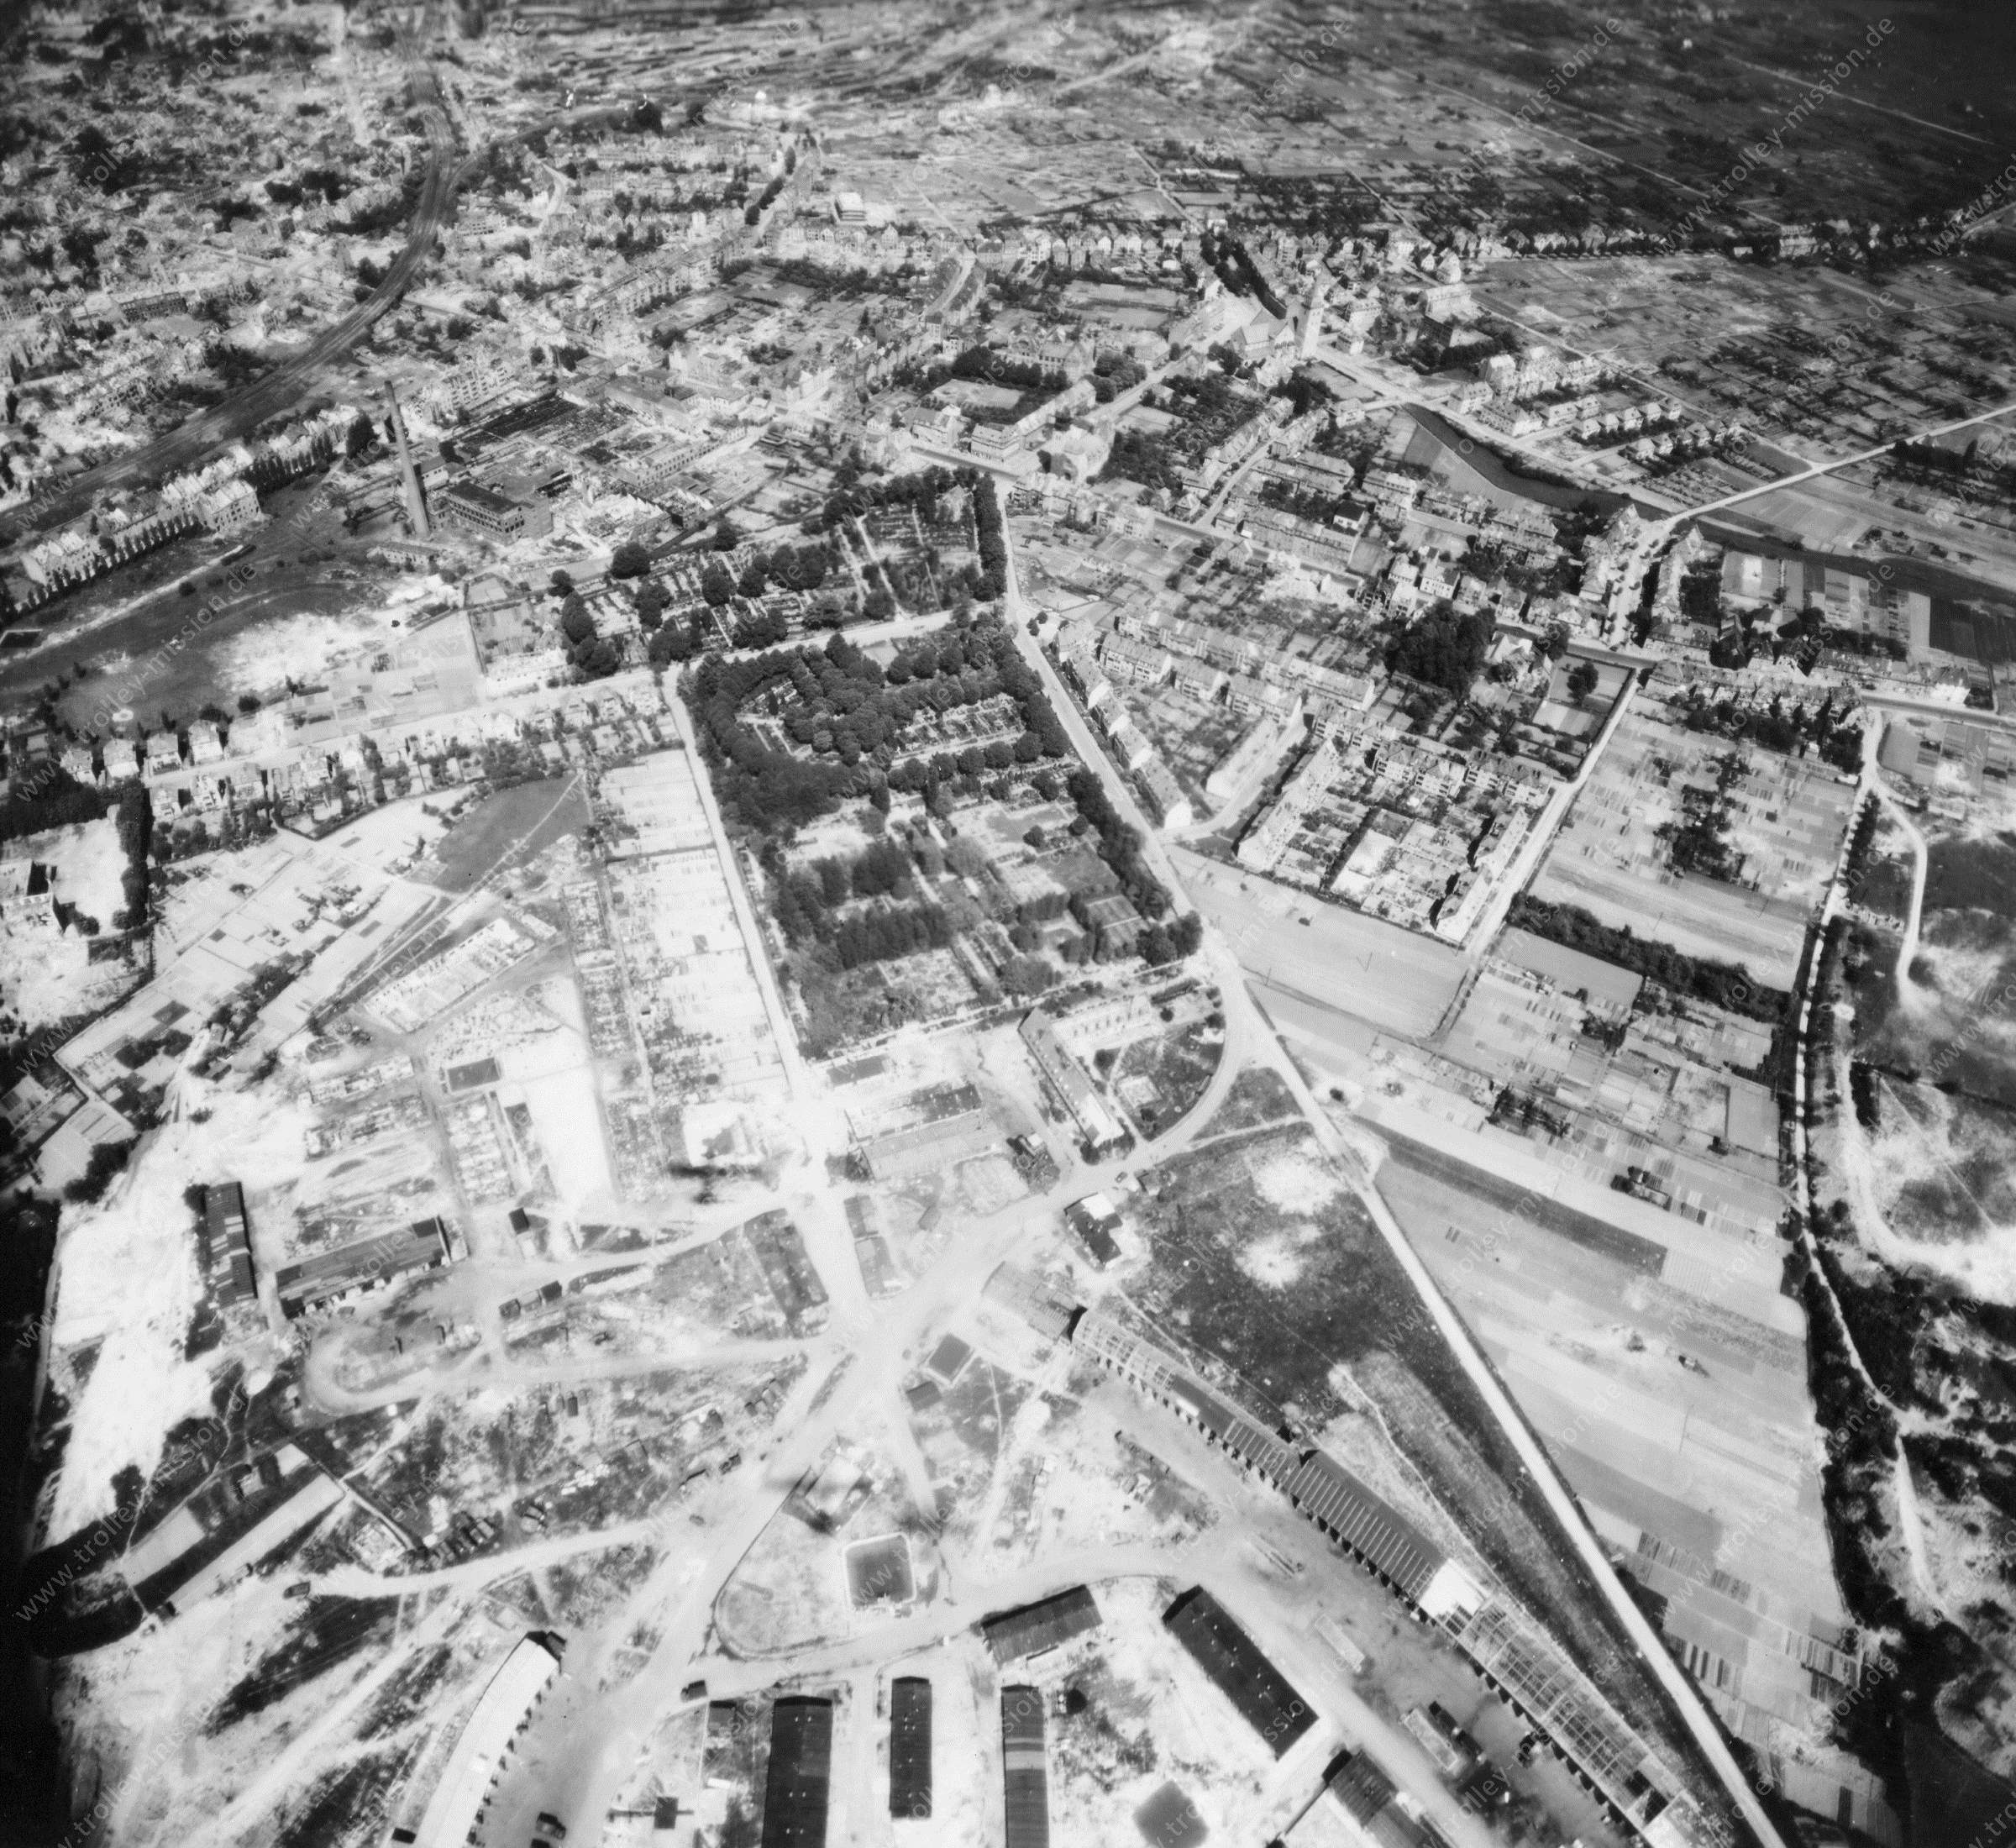 Luftaufnahme Johannisfriedhof sowie Flakstellung am Hauswörmannsweg (später: General-Martini-Kaserne) in Osnabrück im Mai 1945